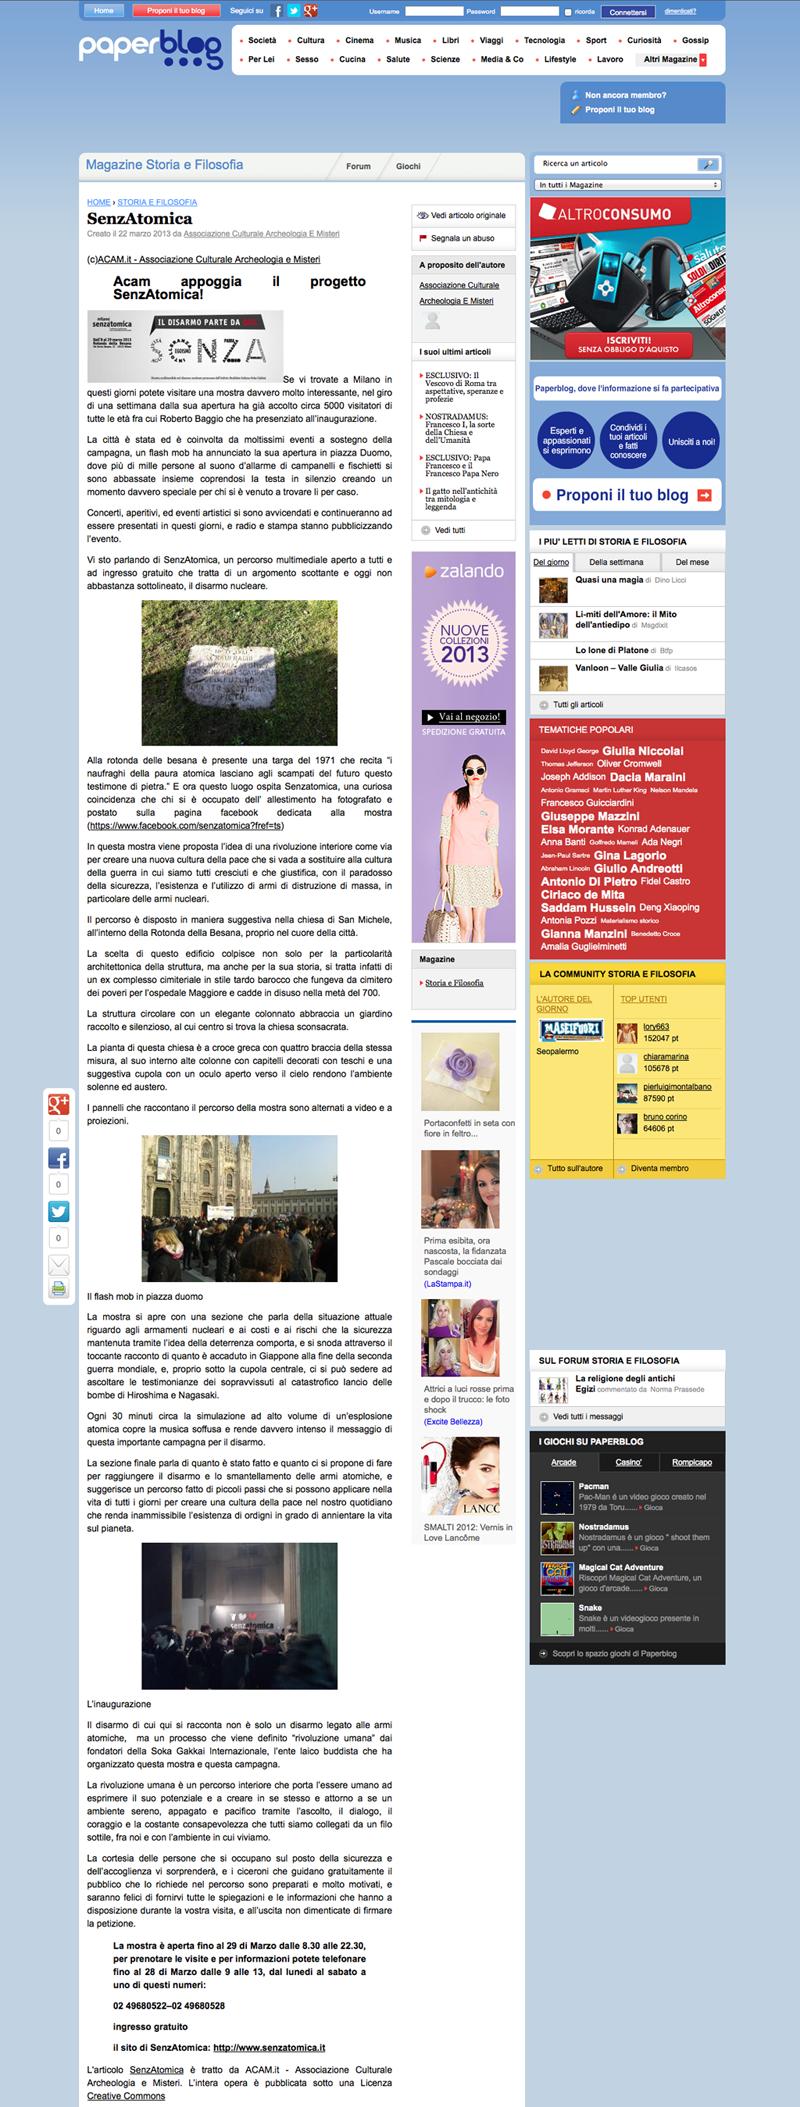 2013-03-22 Paperblog